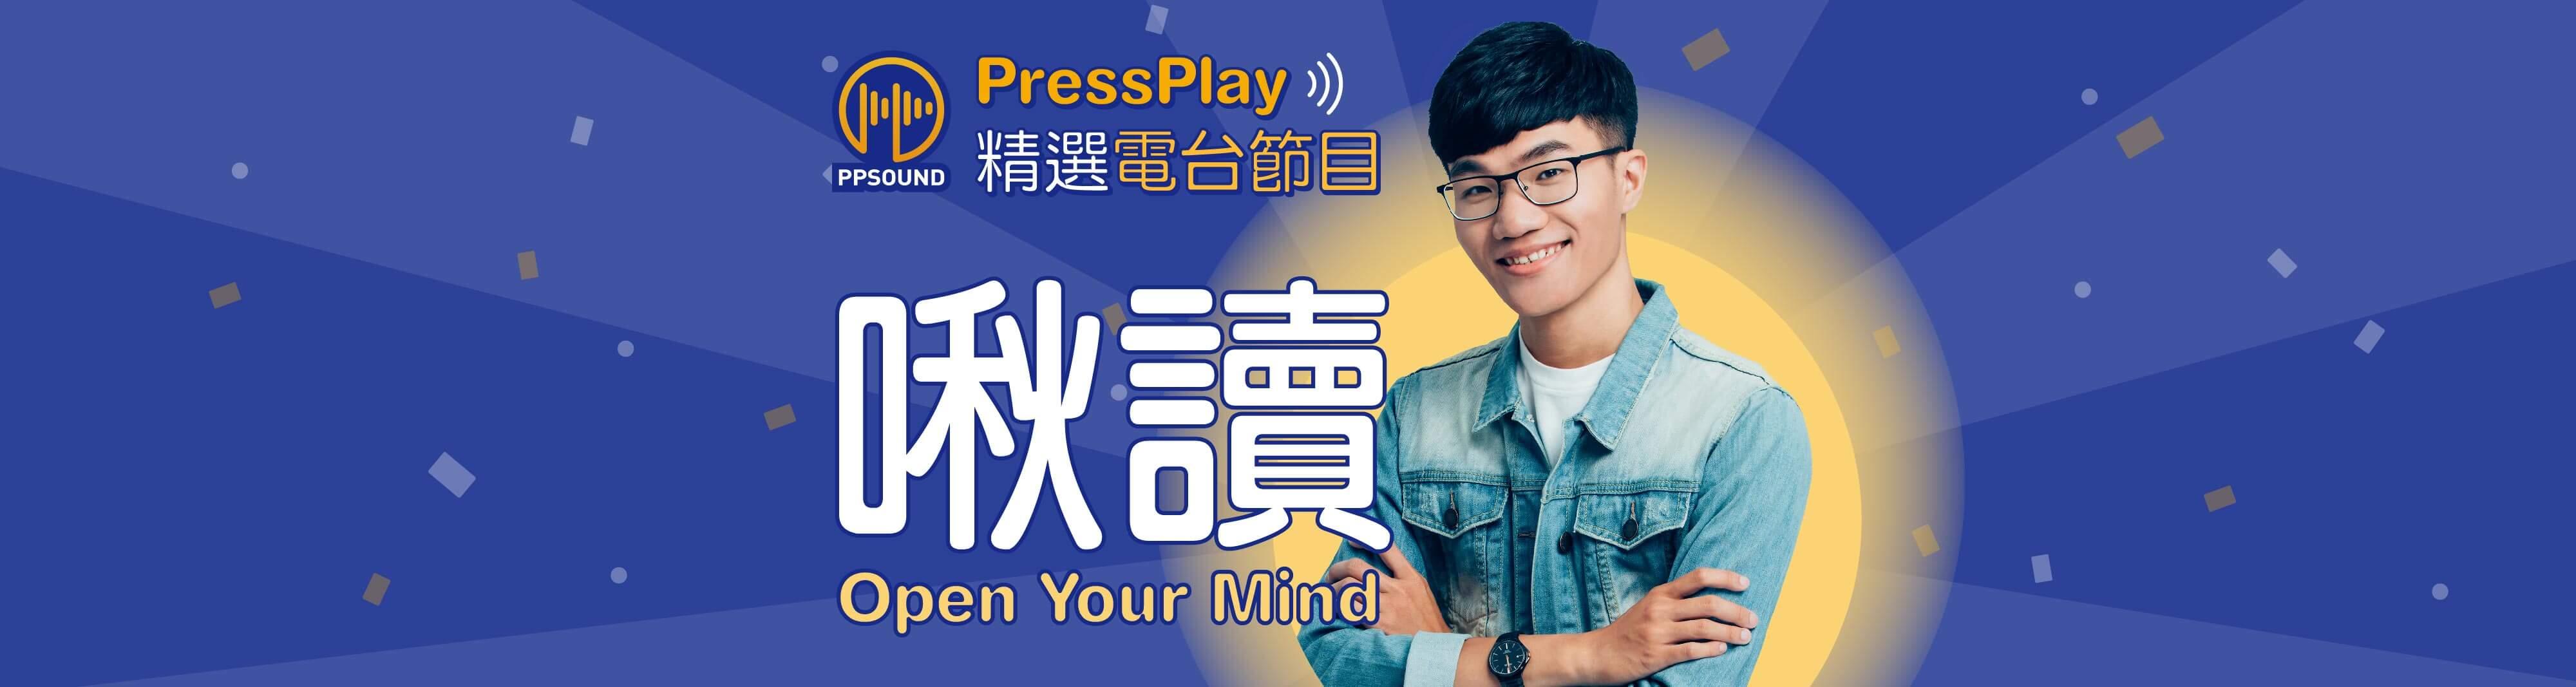 PressPlay - 音頻, 電台, Podcast